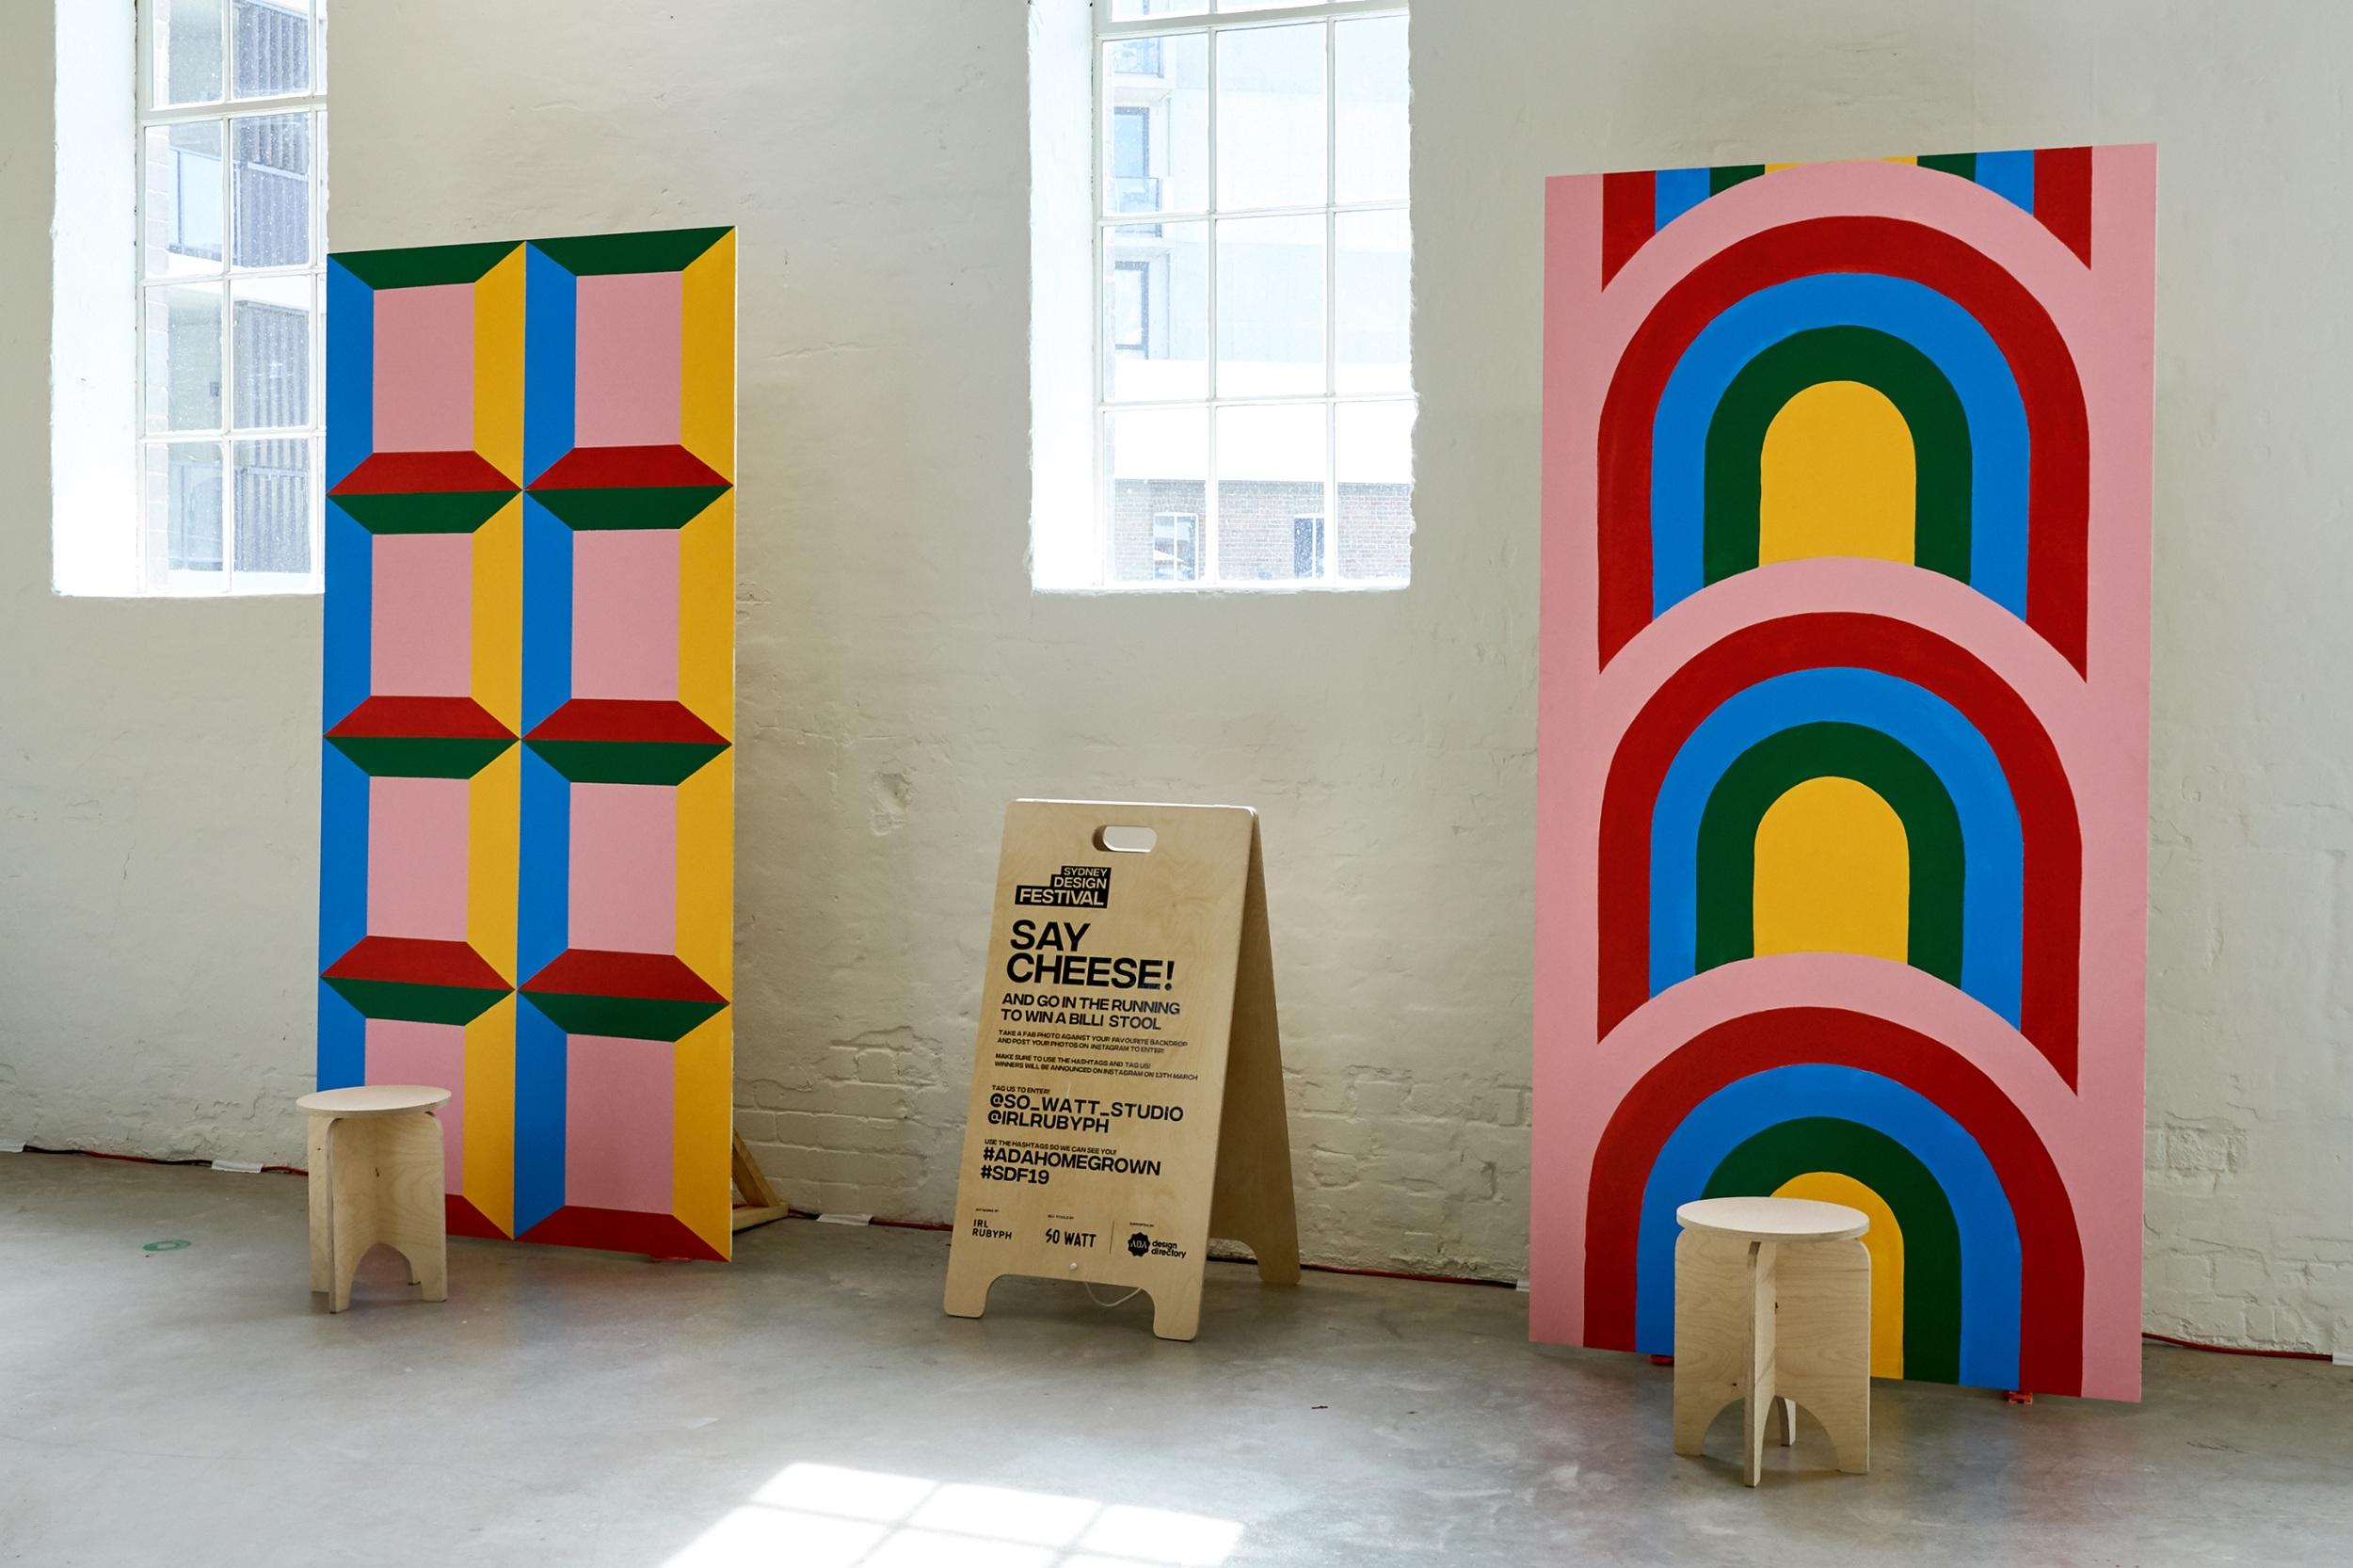 TEMPORARY+-+SoWatt-Temporary-Spaces-Exhibition-Instagram-Pop-Up.jpg